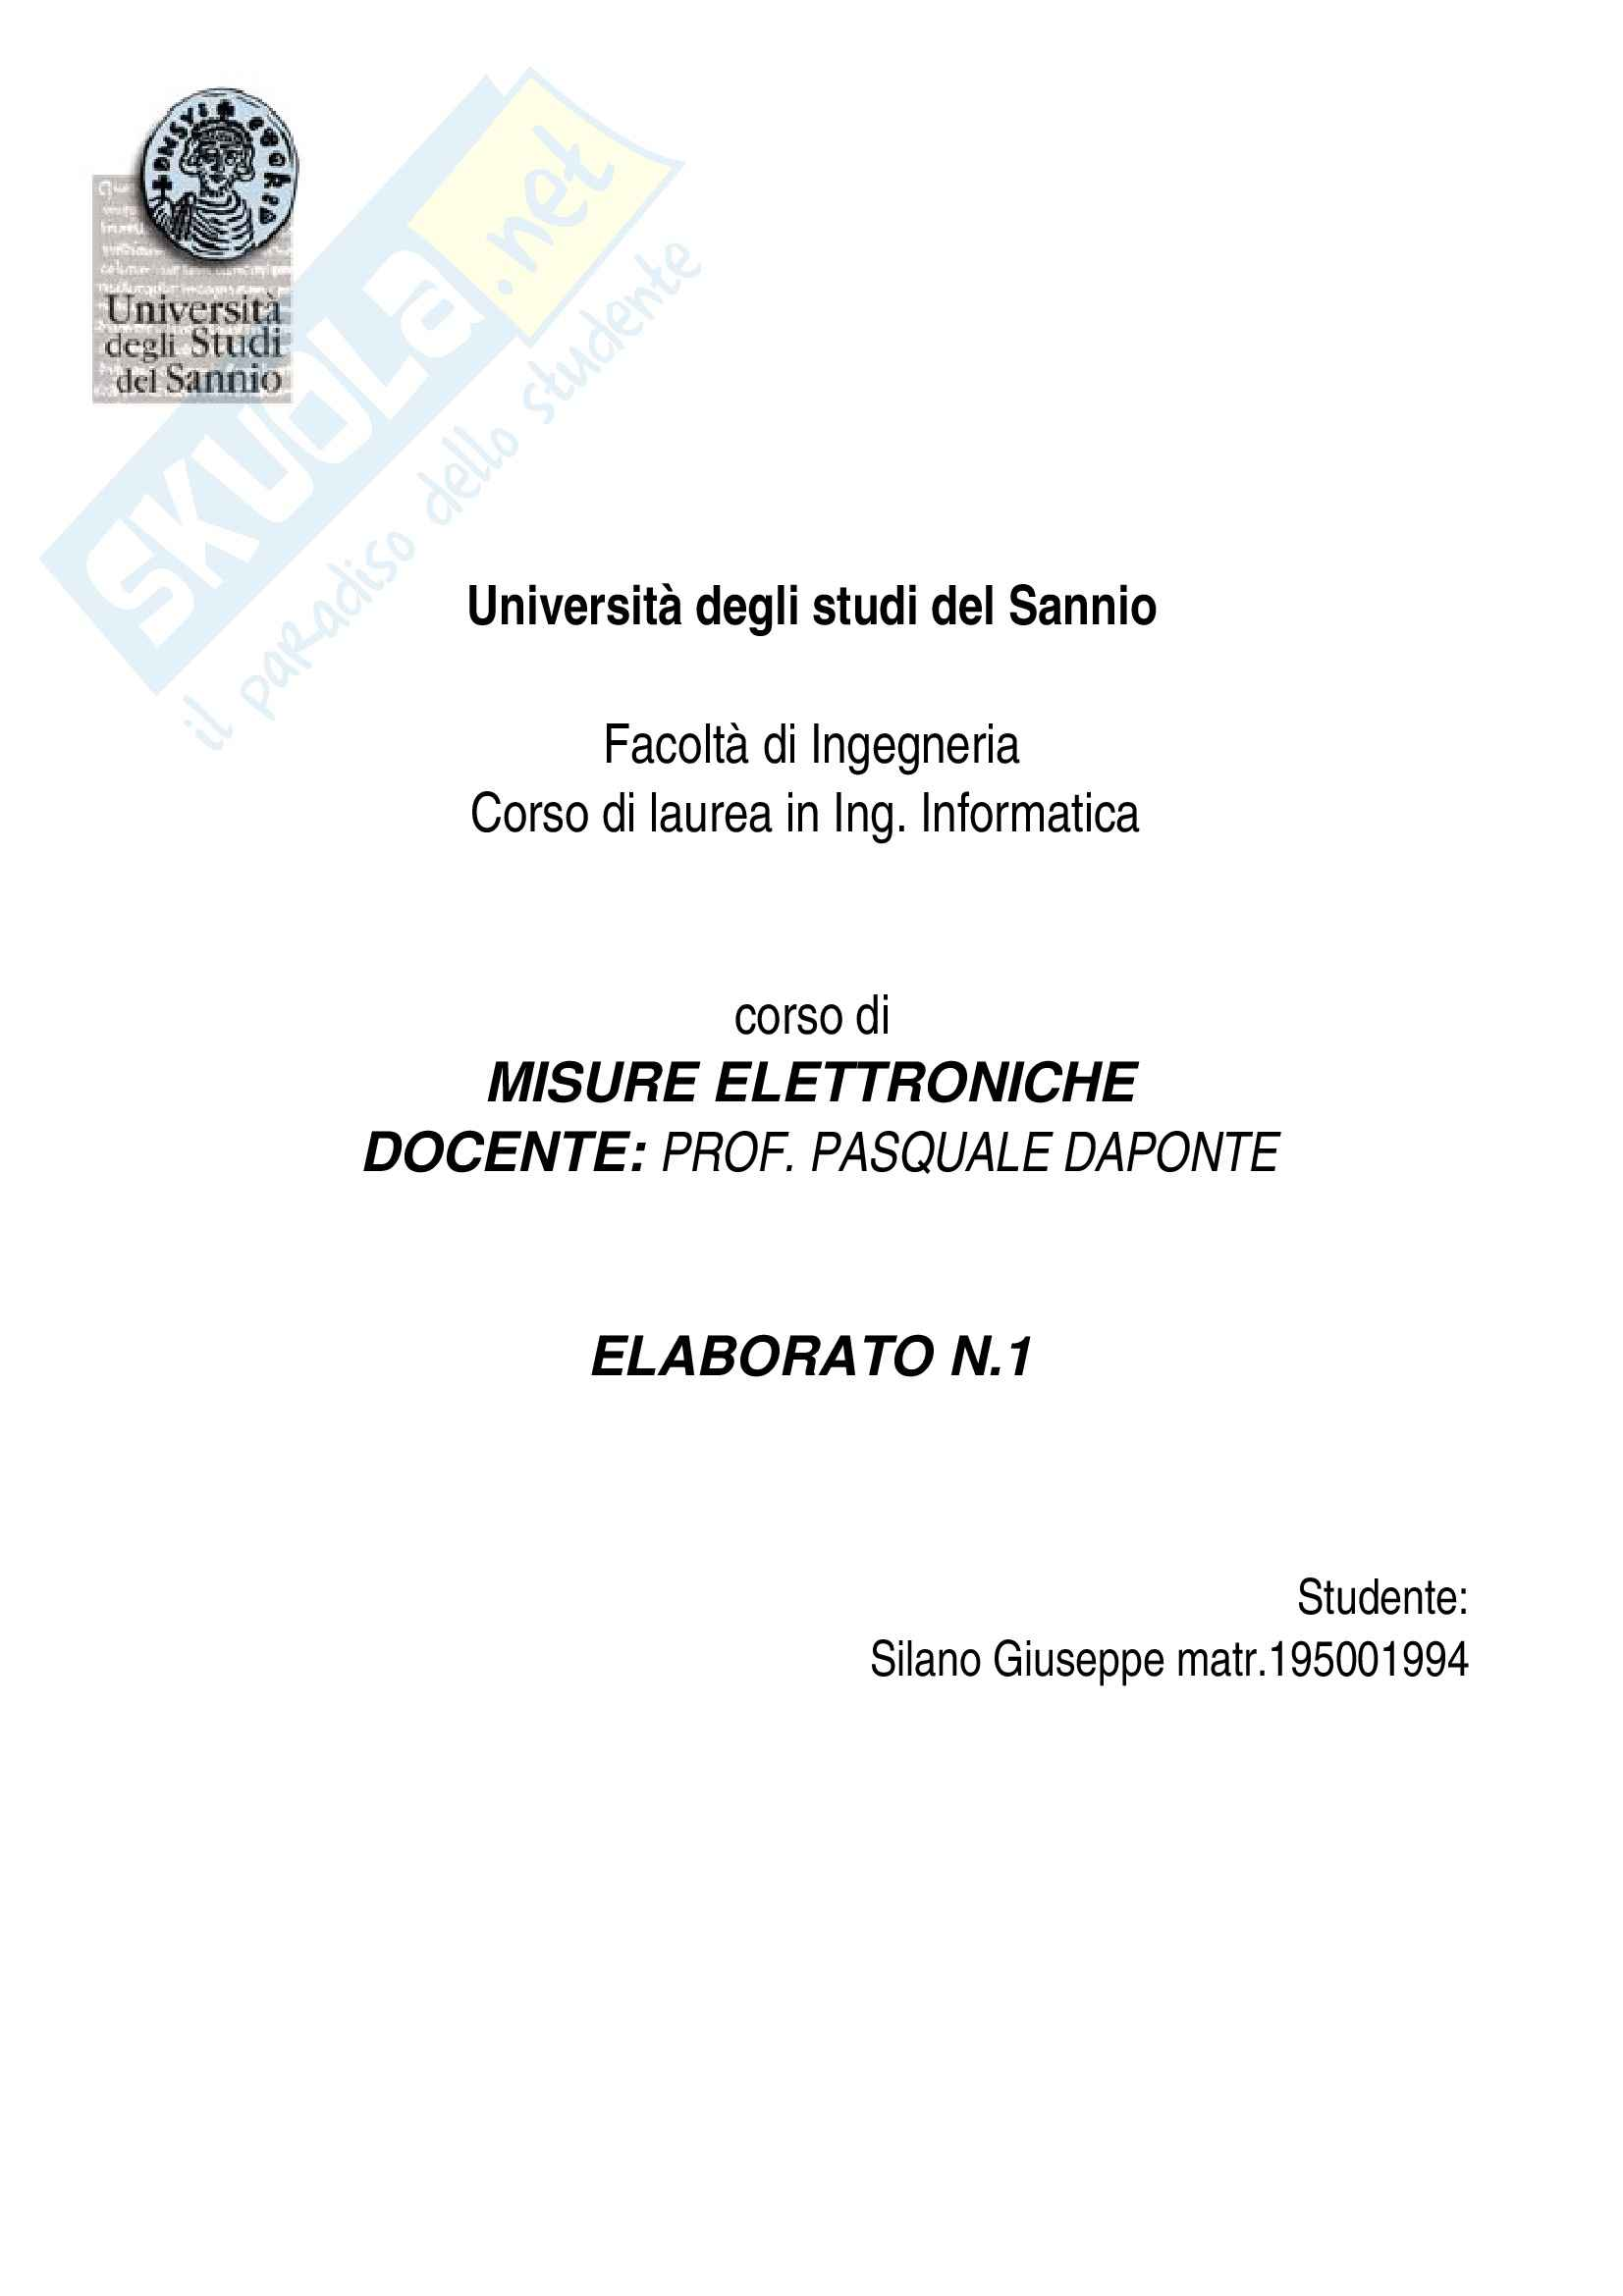 Taratura Voltmetro, Misure elettroniche